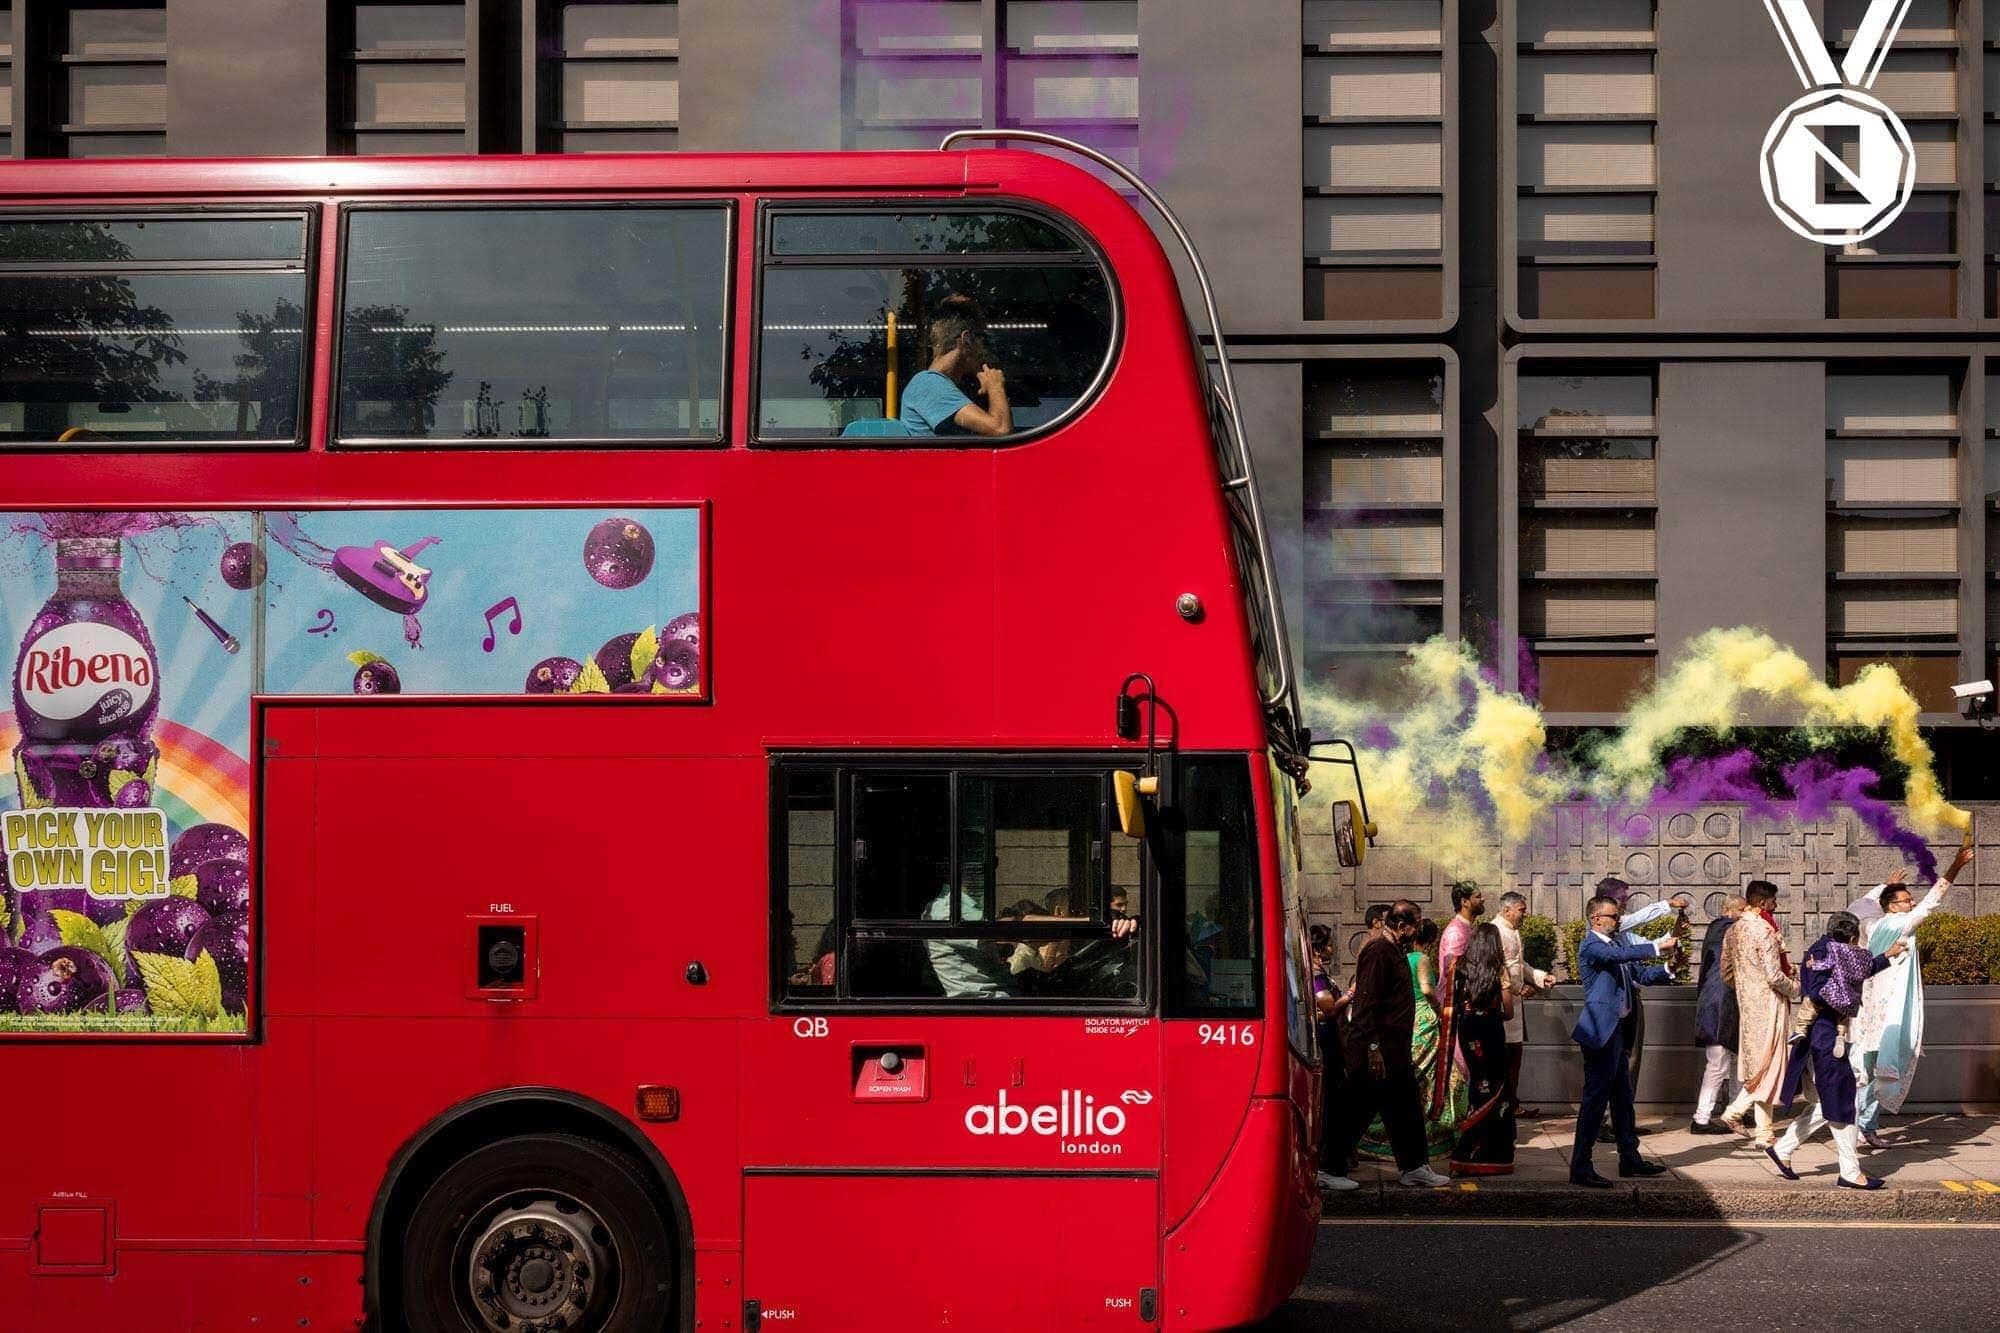 london award winning photo